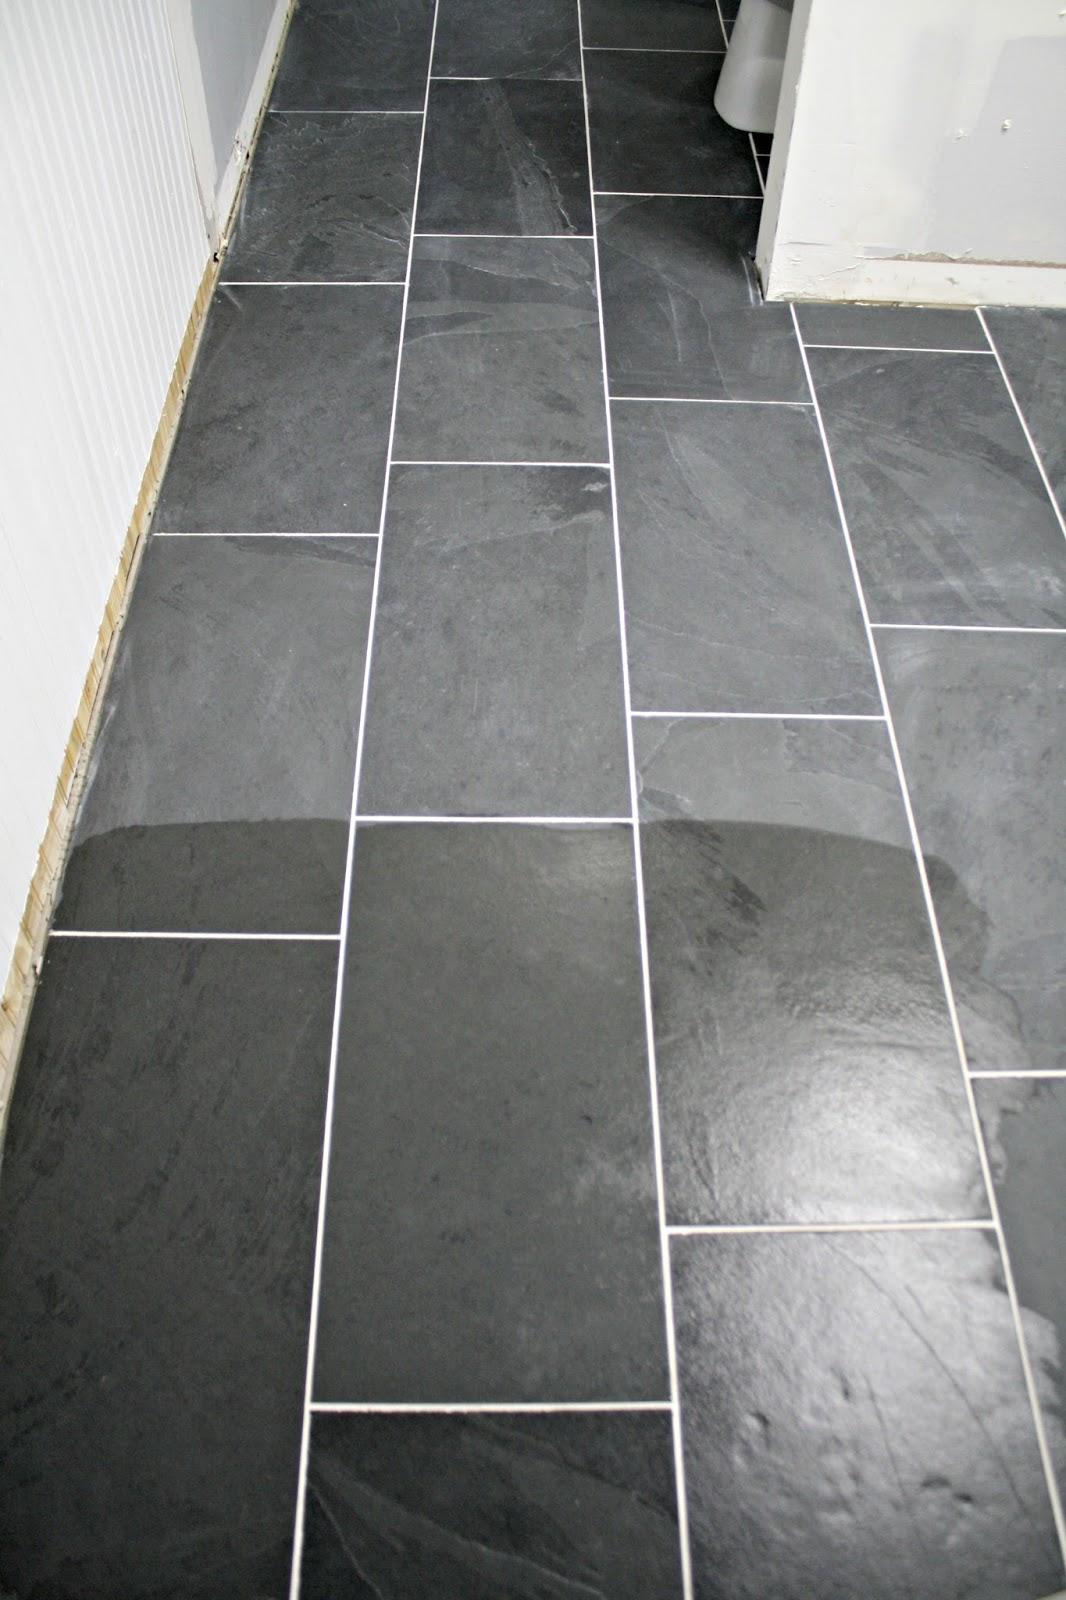 Wet Look Tile Sealer | Tile Design Ideas